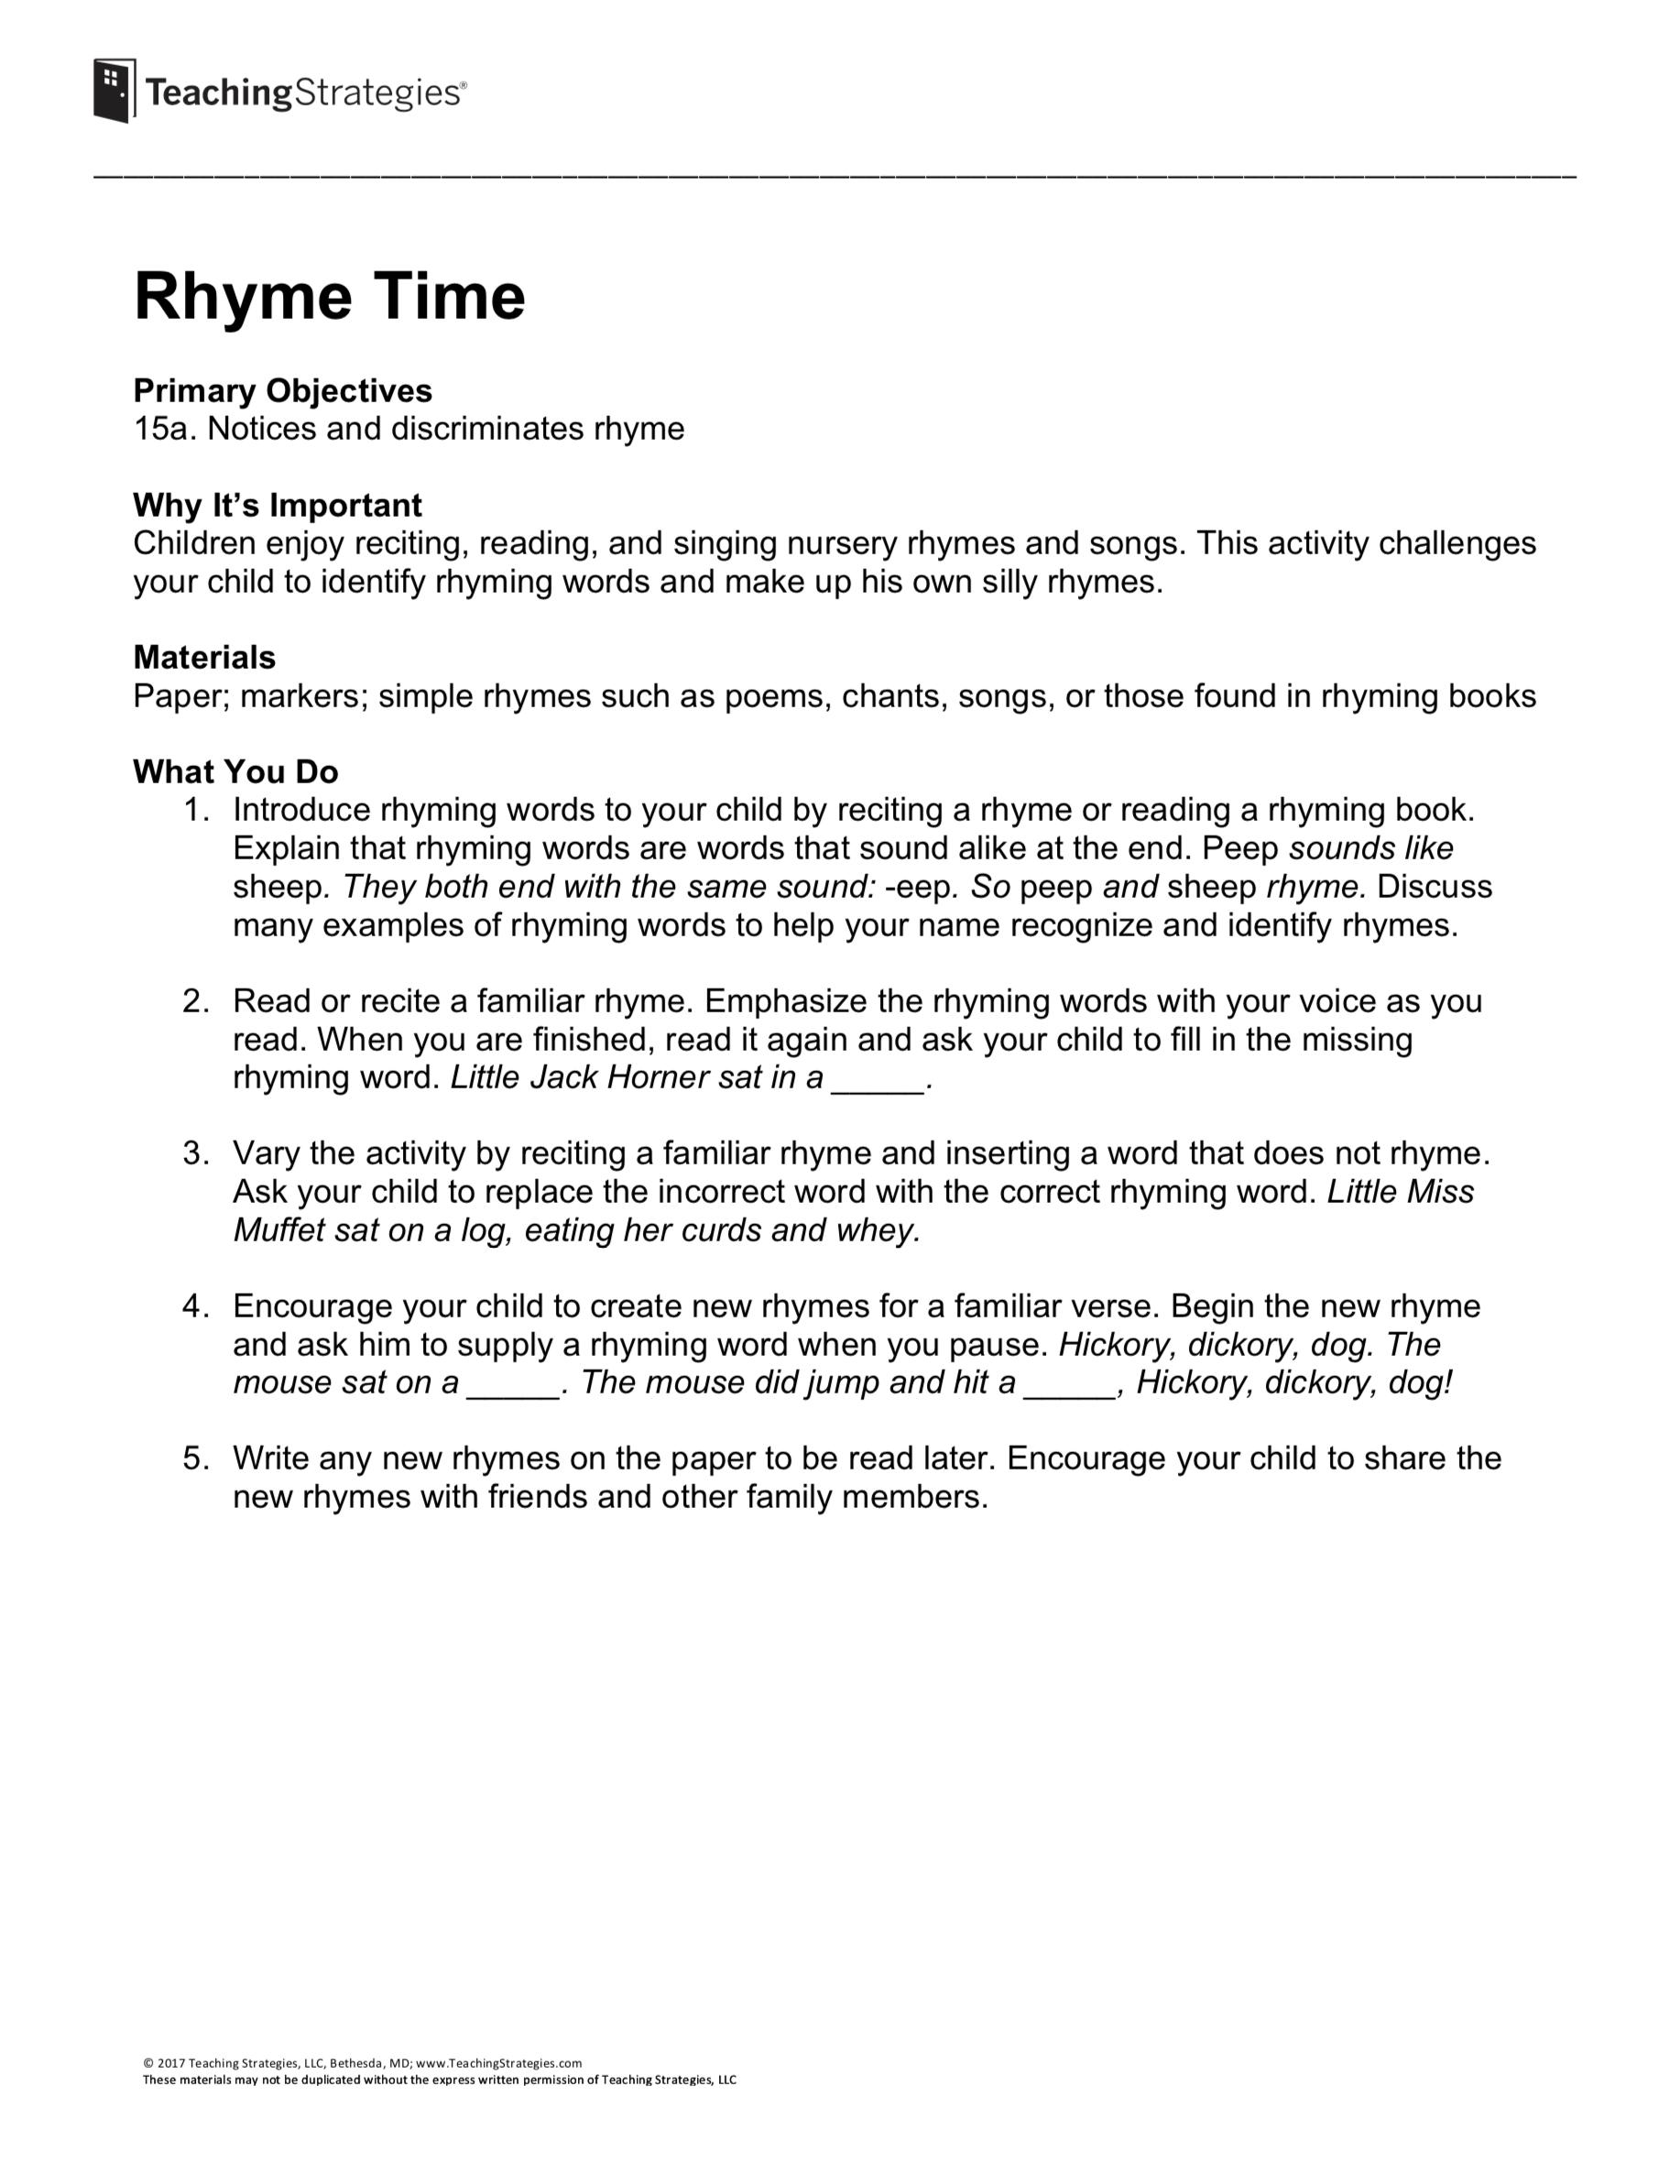 Rhyme Time Preschool Resource